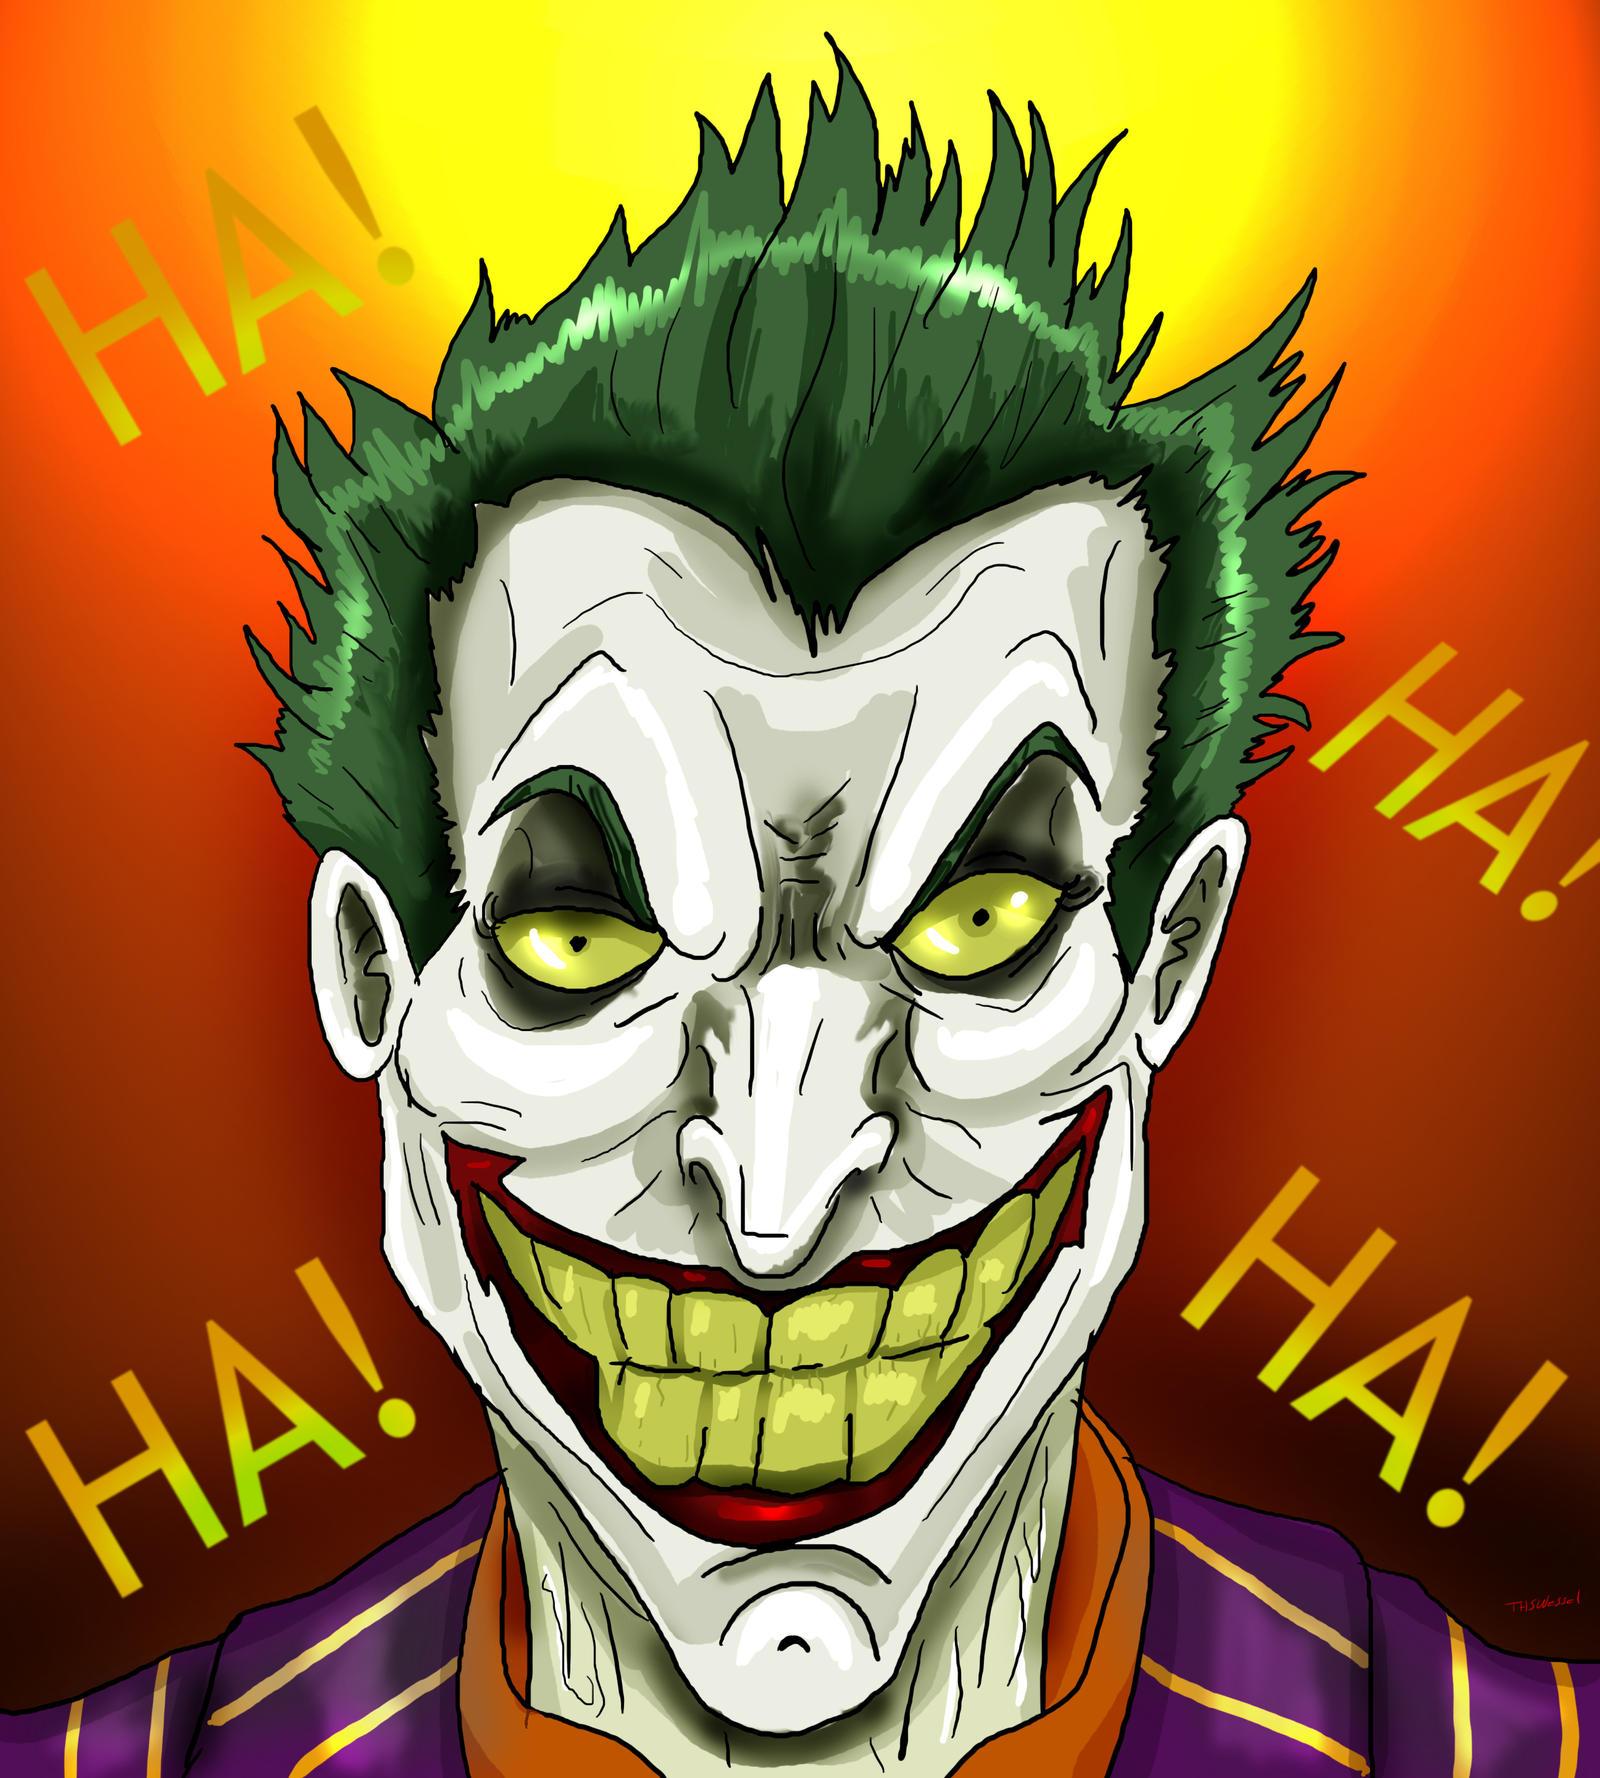 Znalezione obrazy dla zapytania joker laugh